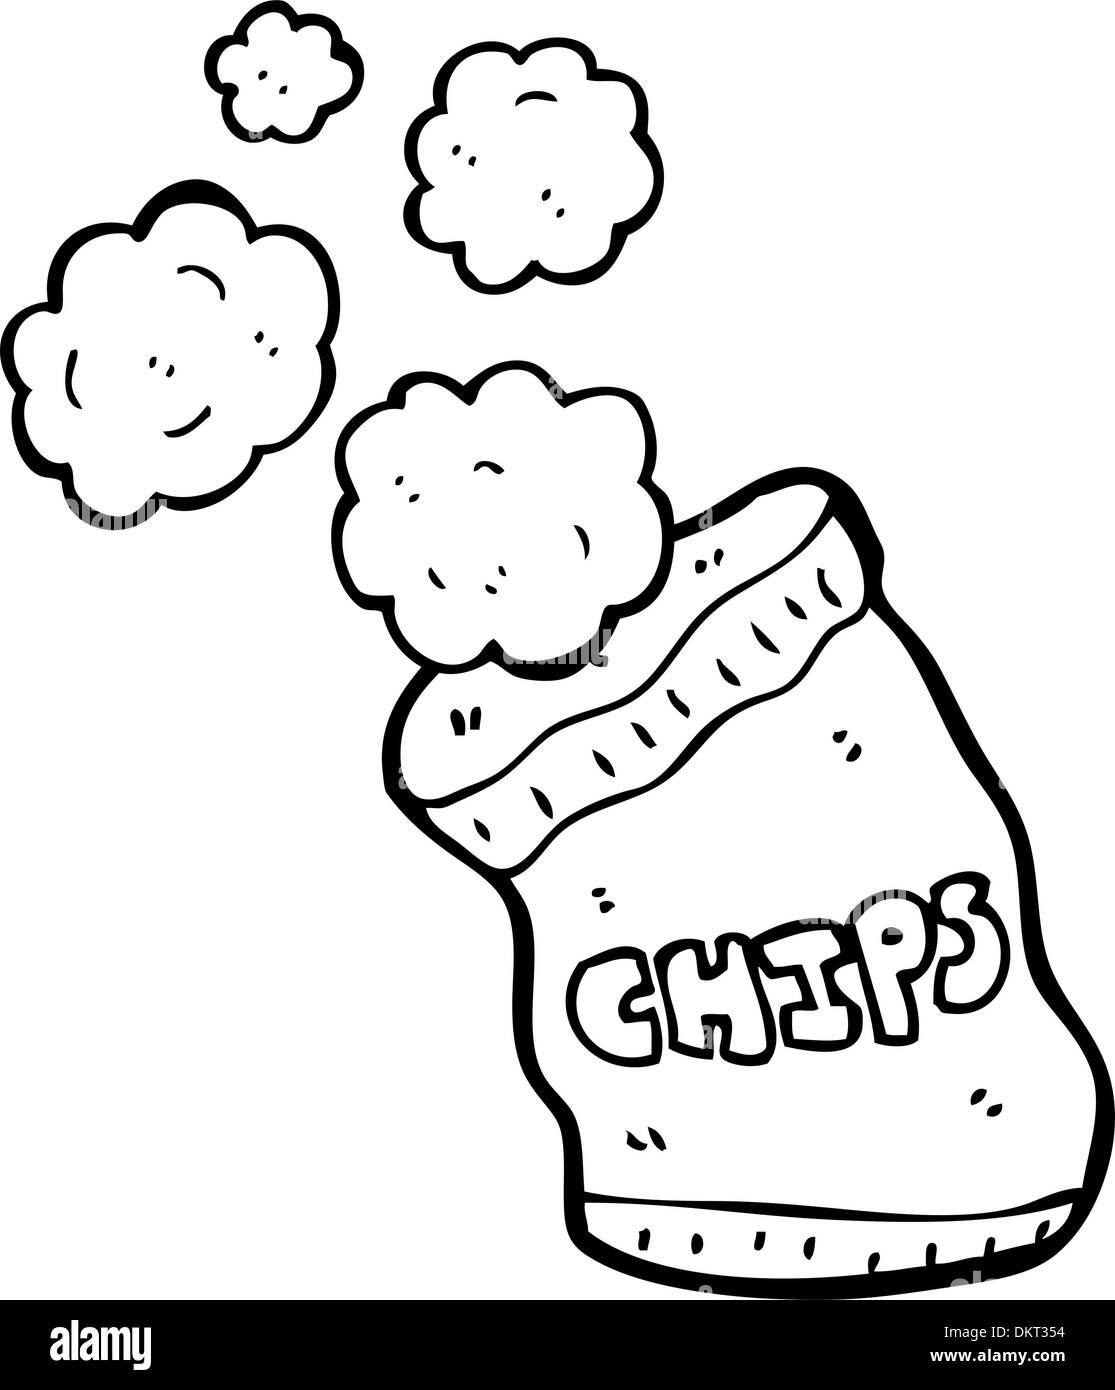 cartoon potato chips - Stock Image